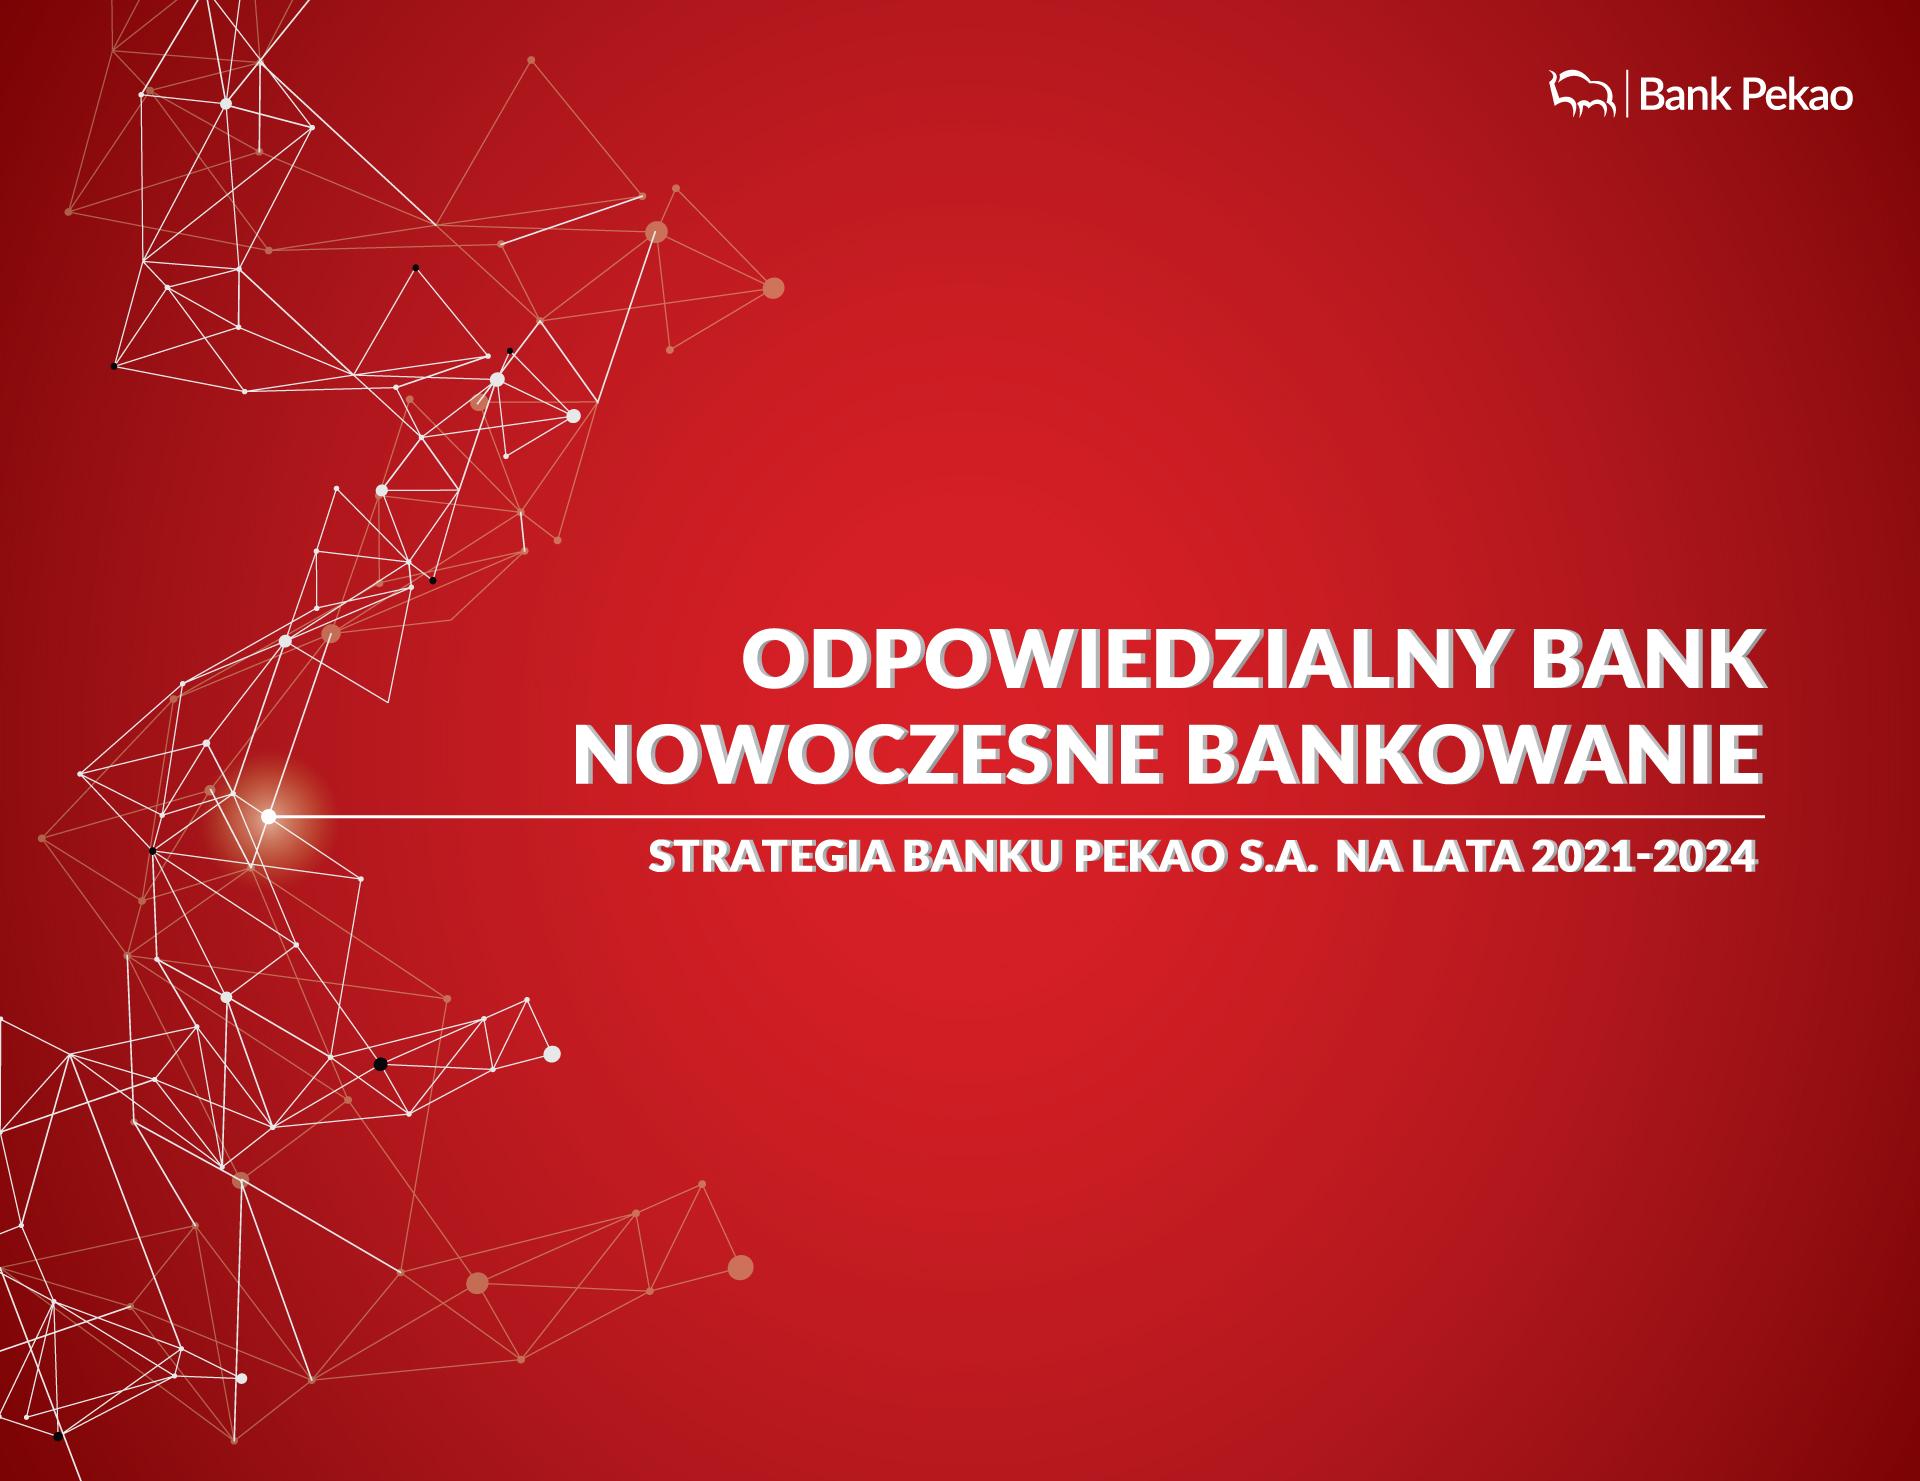 nowa strategia banku pko - grafika wpisu